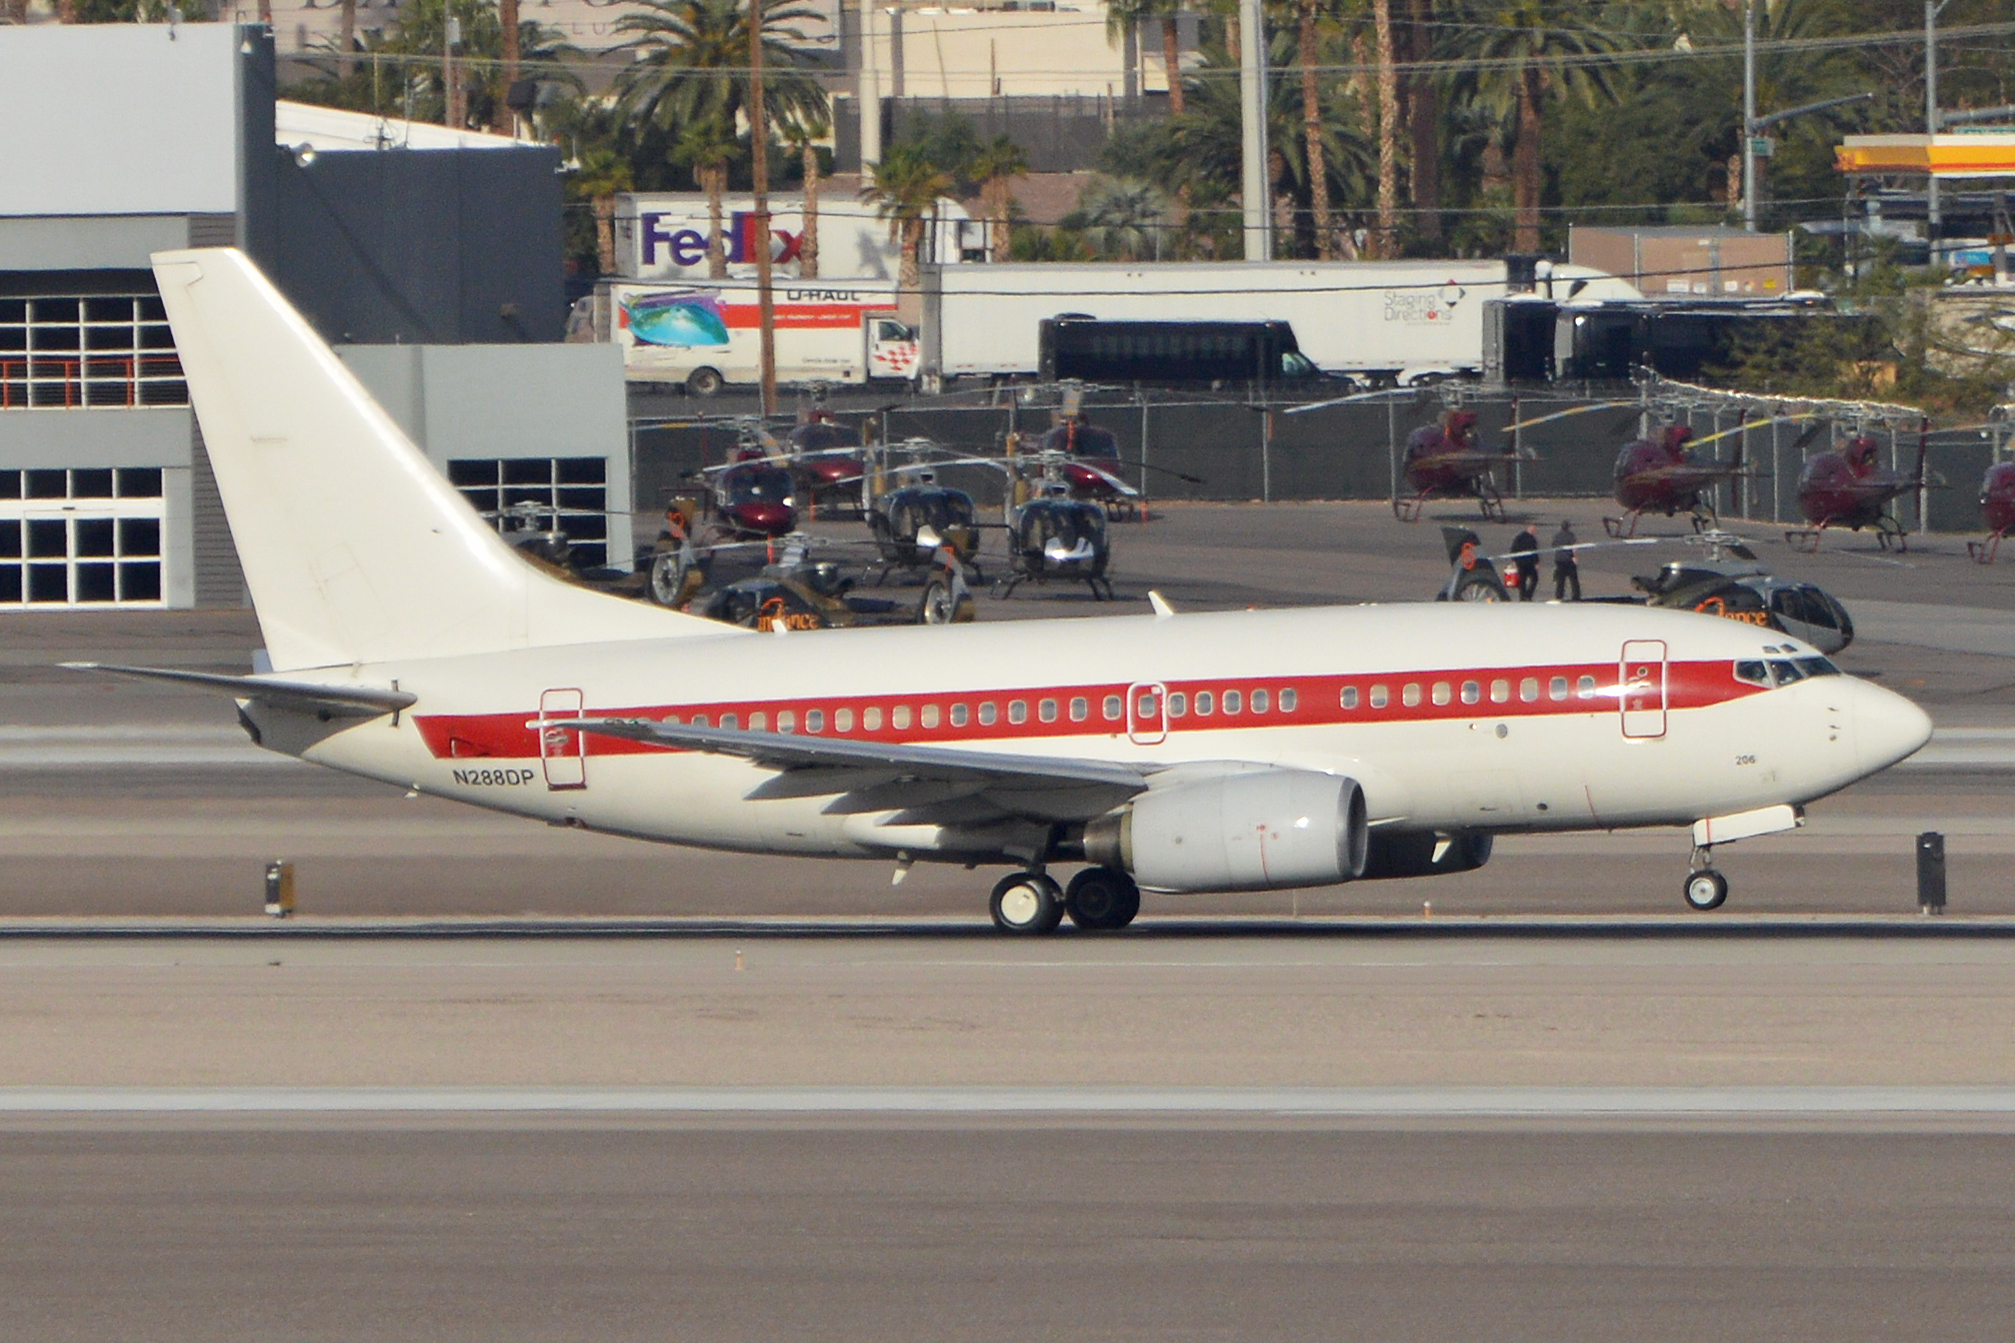 America's Secret Airline To Area 51 Is Now Hiring Flight Attendants